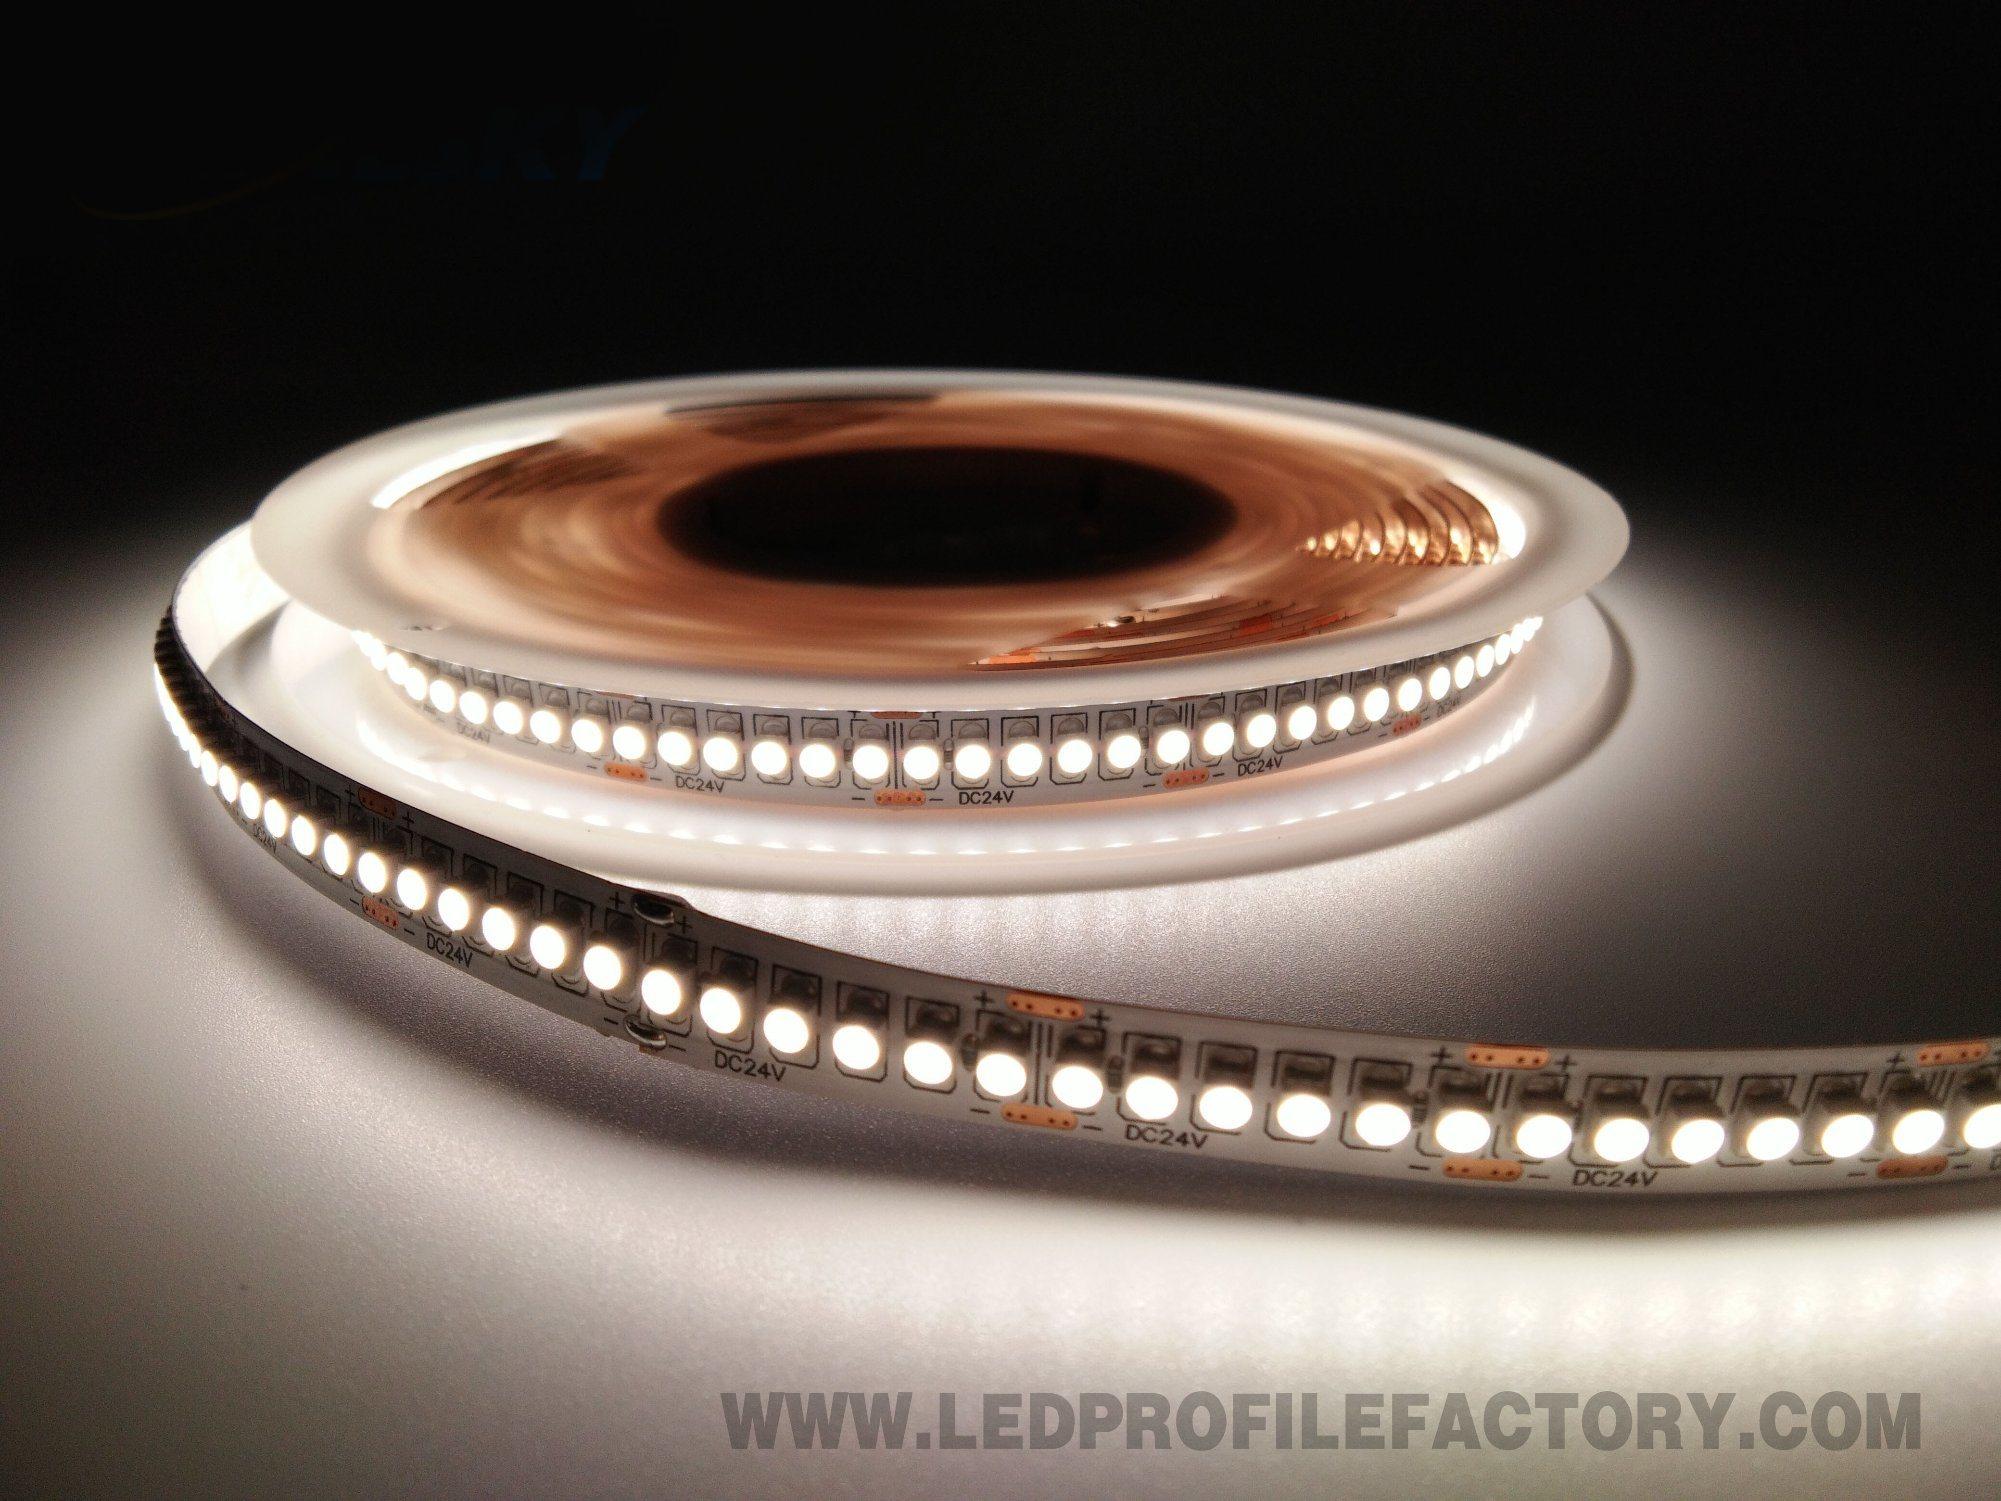 LED Alu Profile Linear Light for 2835 LED Strip